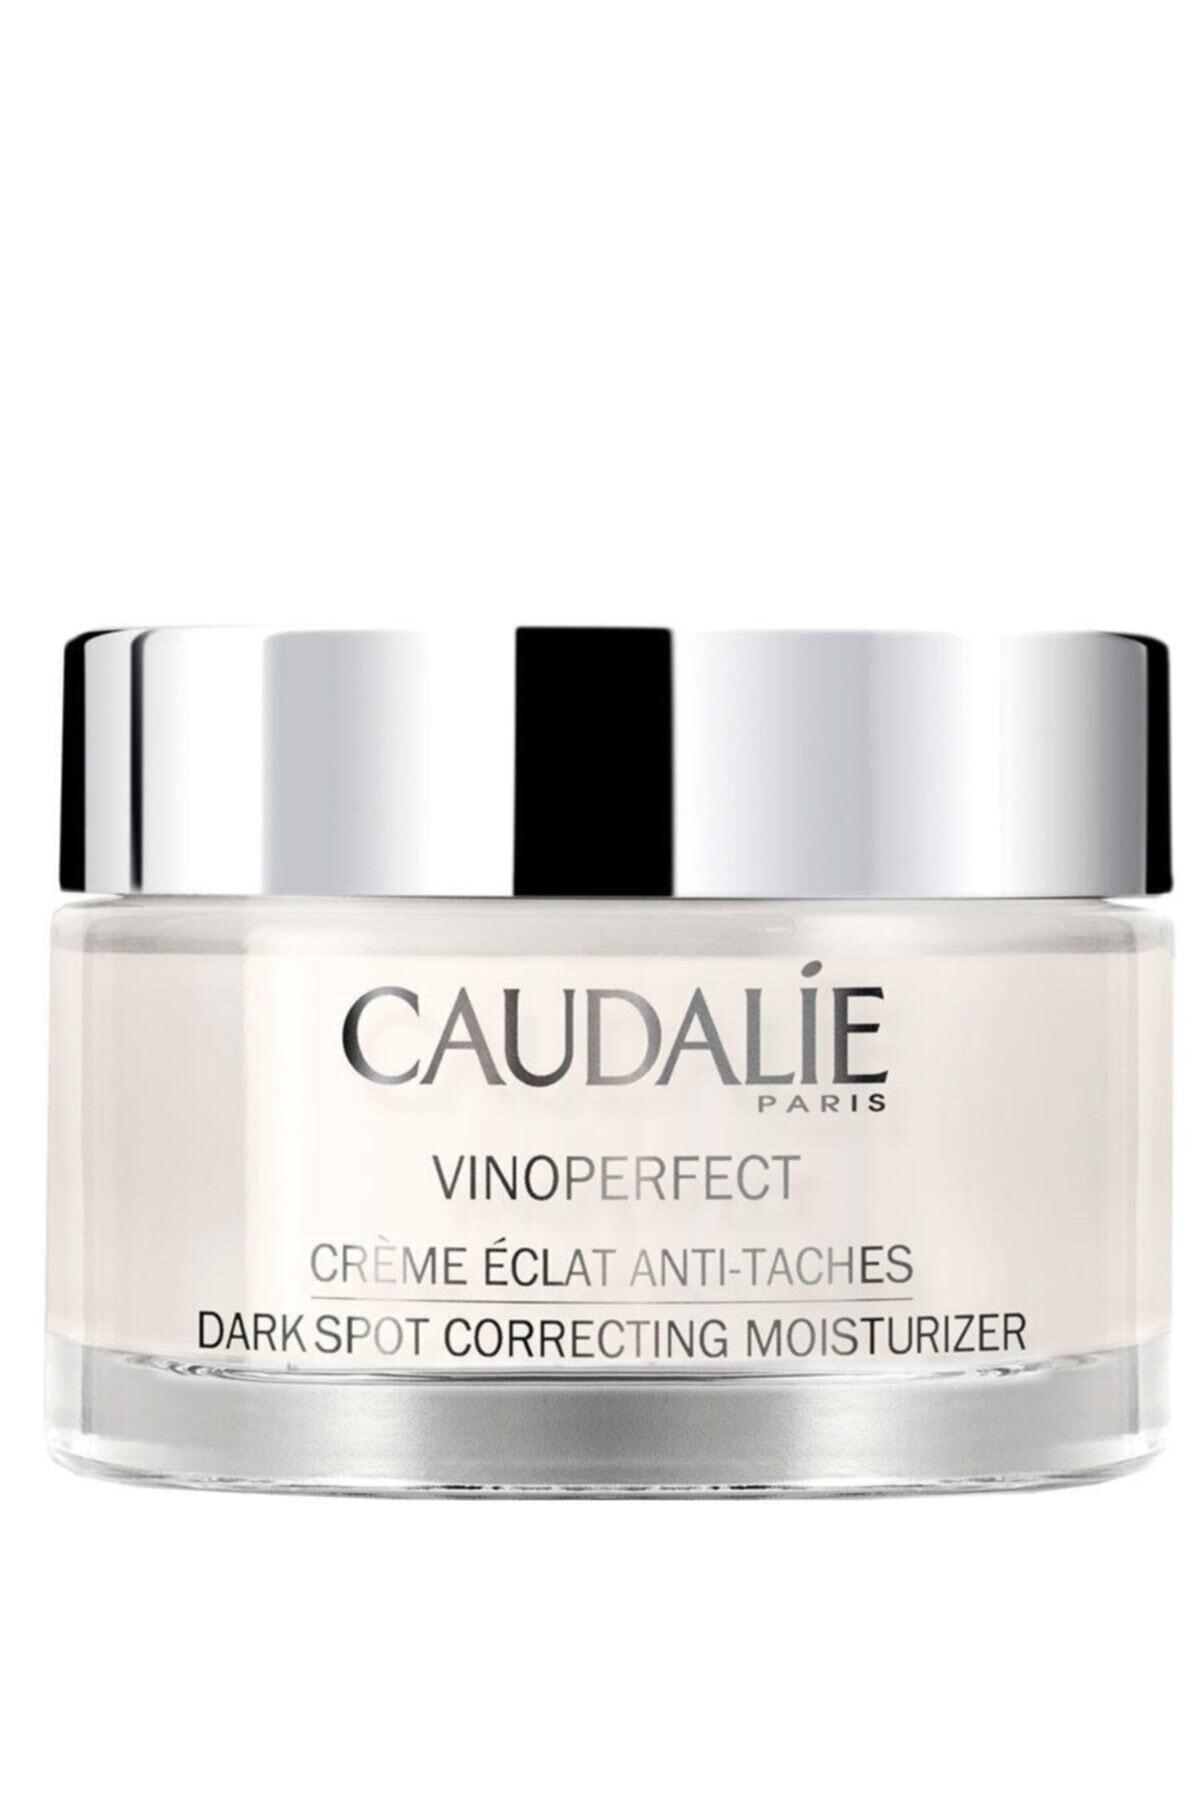 Caudalie Vinoperfect Dark Spot Correcting Moisturizer 50 ml 1